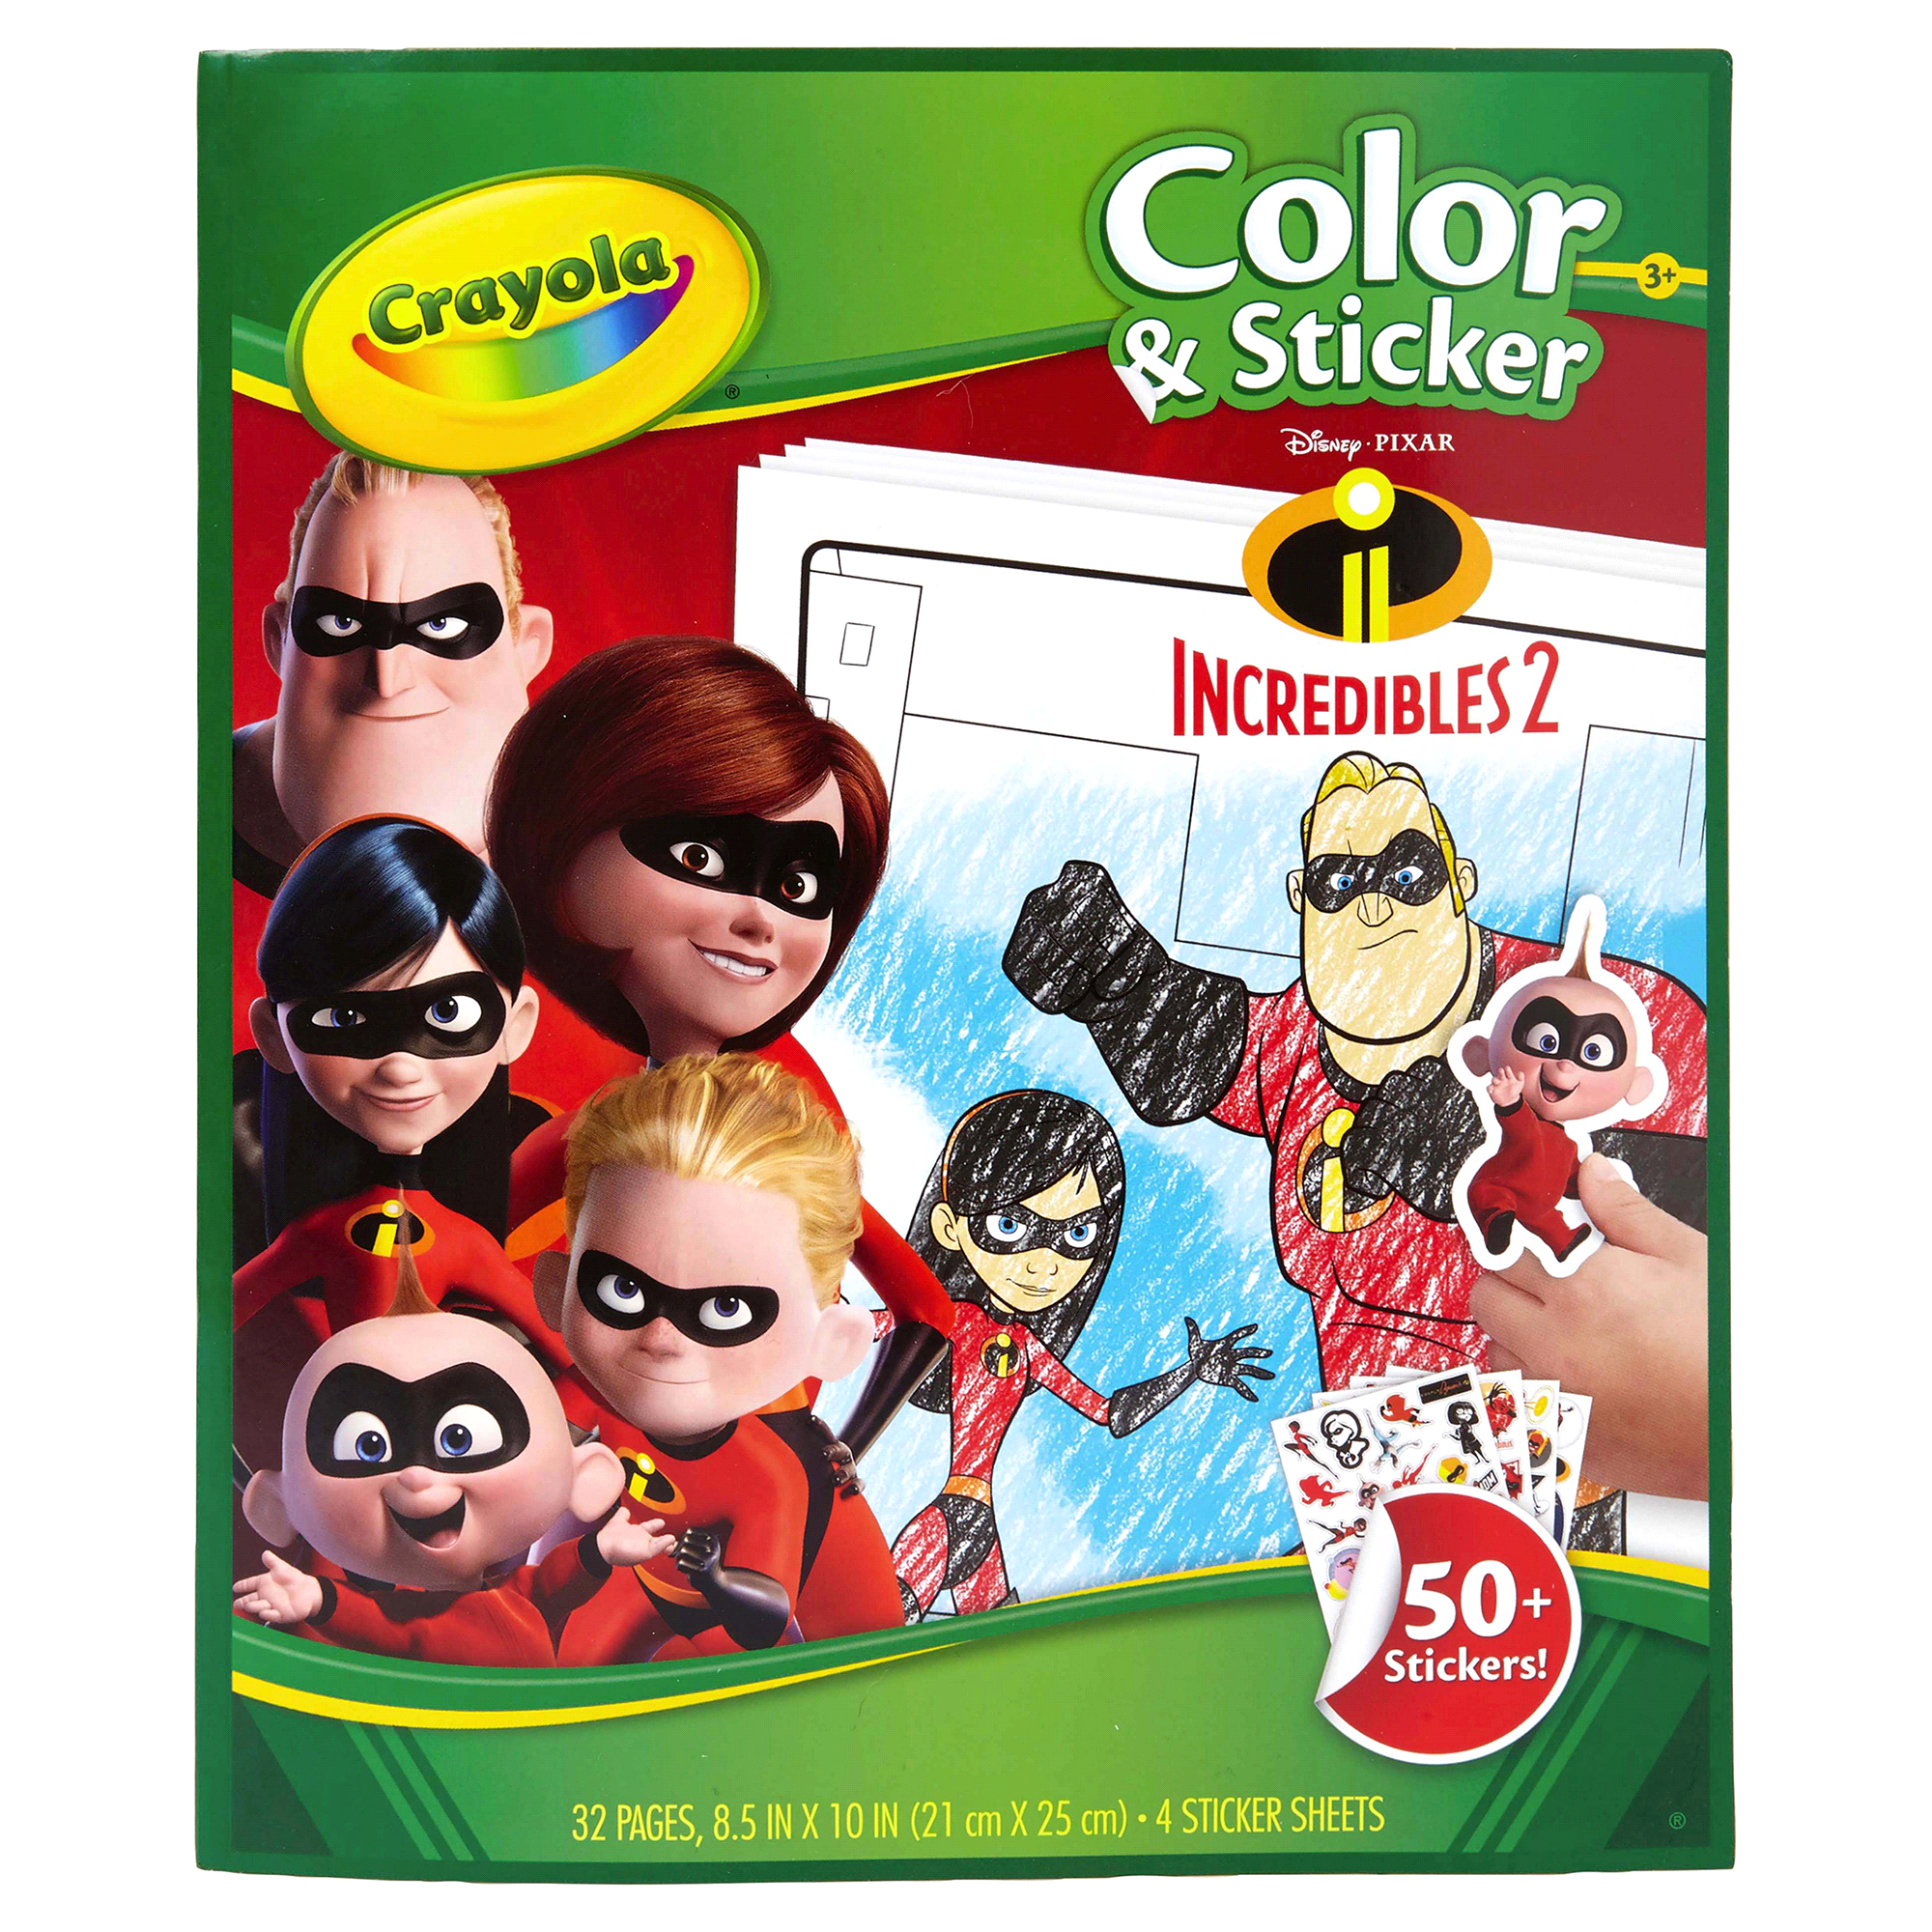 Crayola Incredibles 2 Color & Sticker Book   Meijer.com